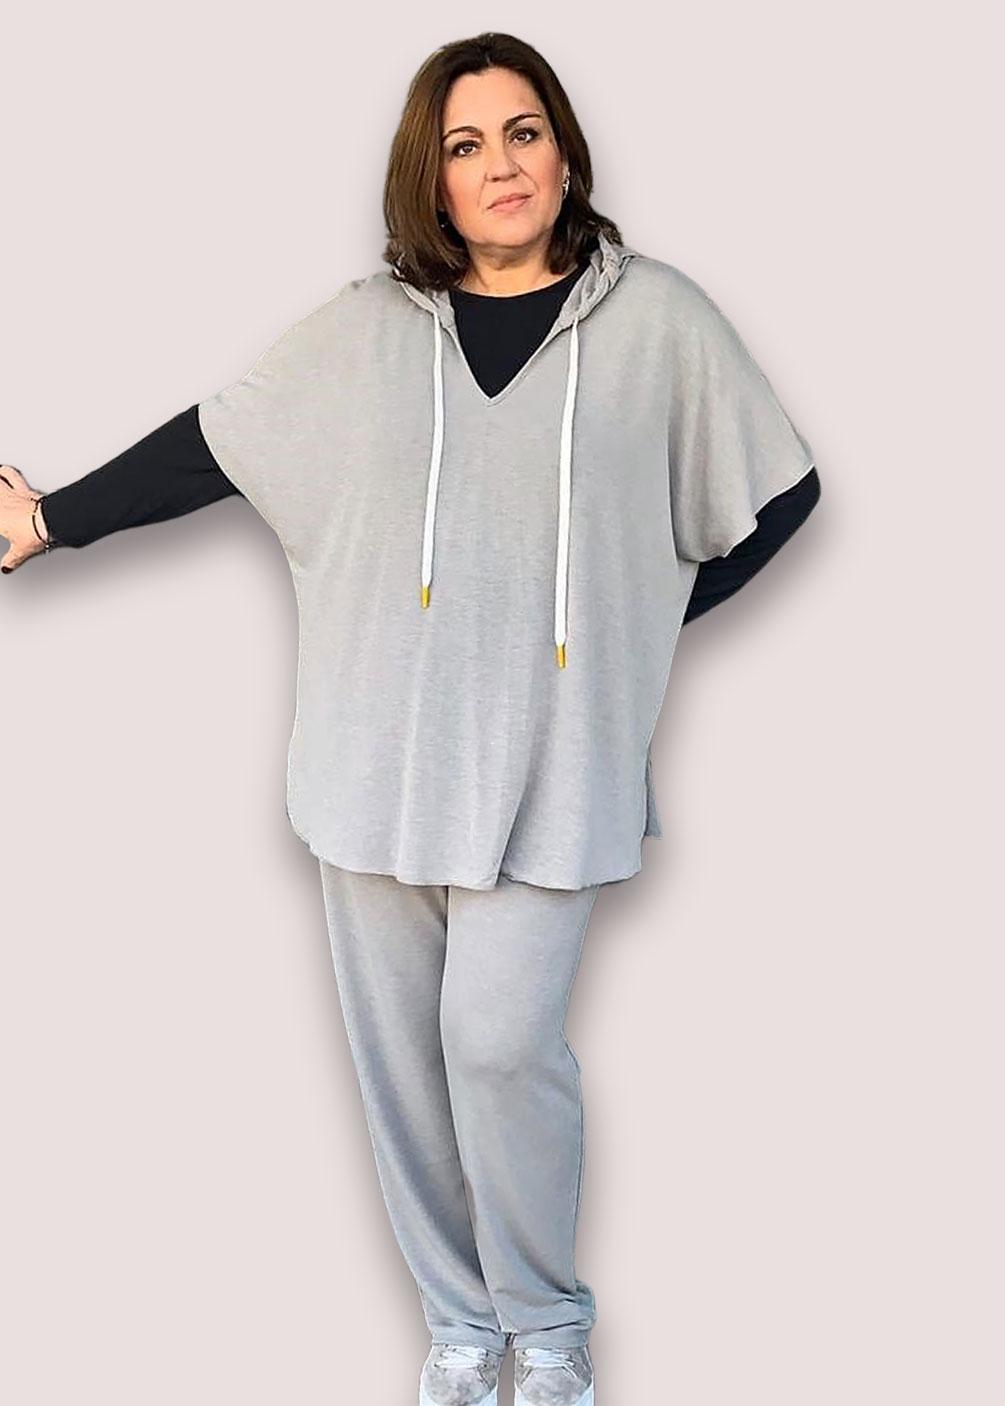 sudadera capucha deporte tallas grandes marca indra tallas grandes